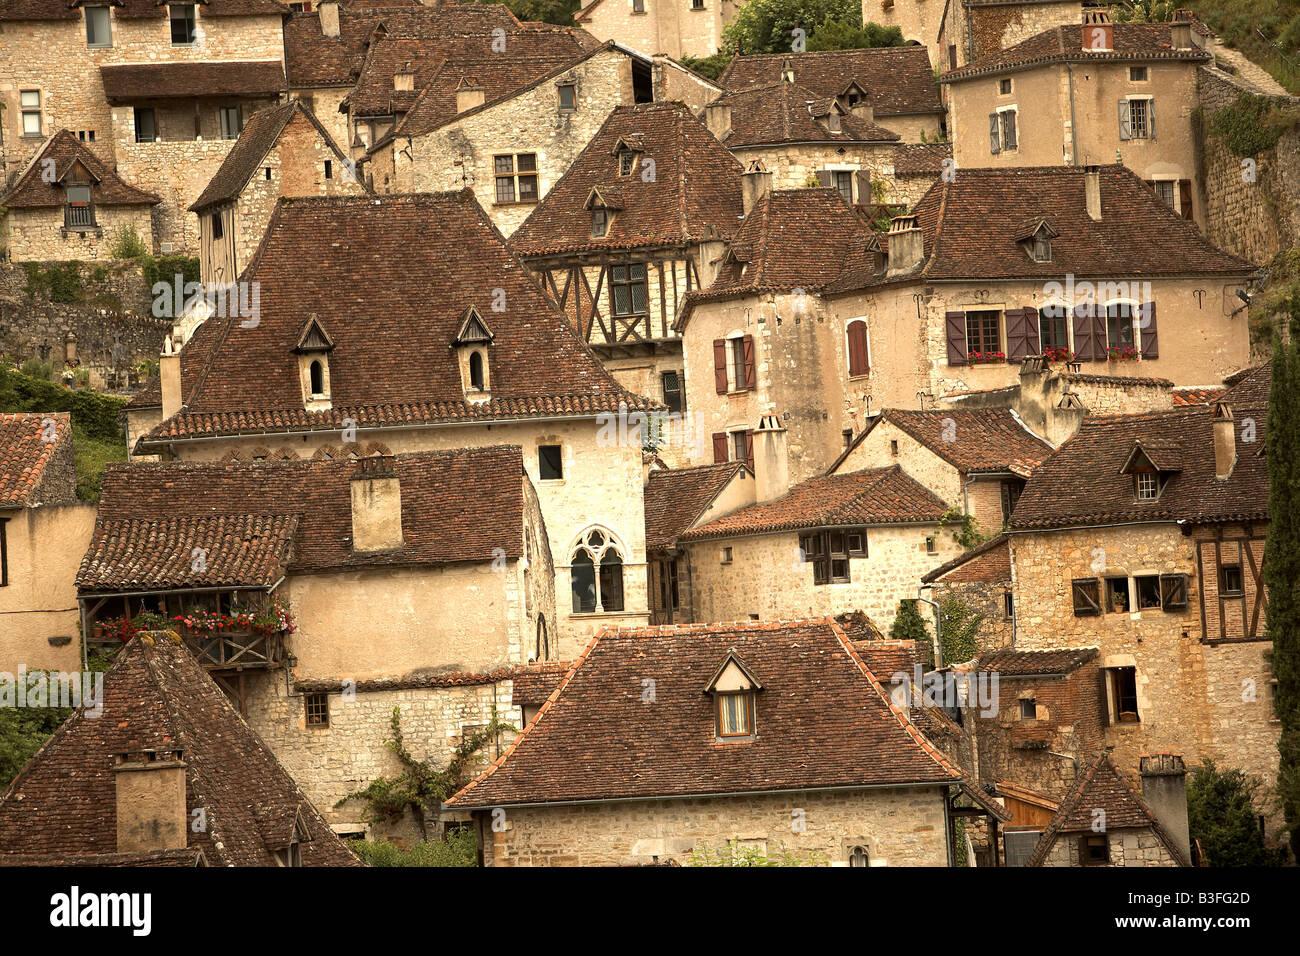 Lot Vallee du Lot Saint Cirq Lapopie The old village of Lapopie Midi Pyrenees France Europe - Stock Image